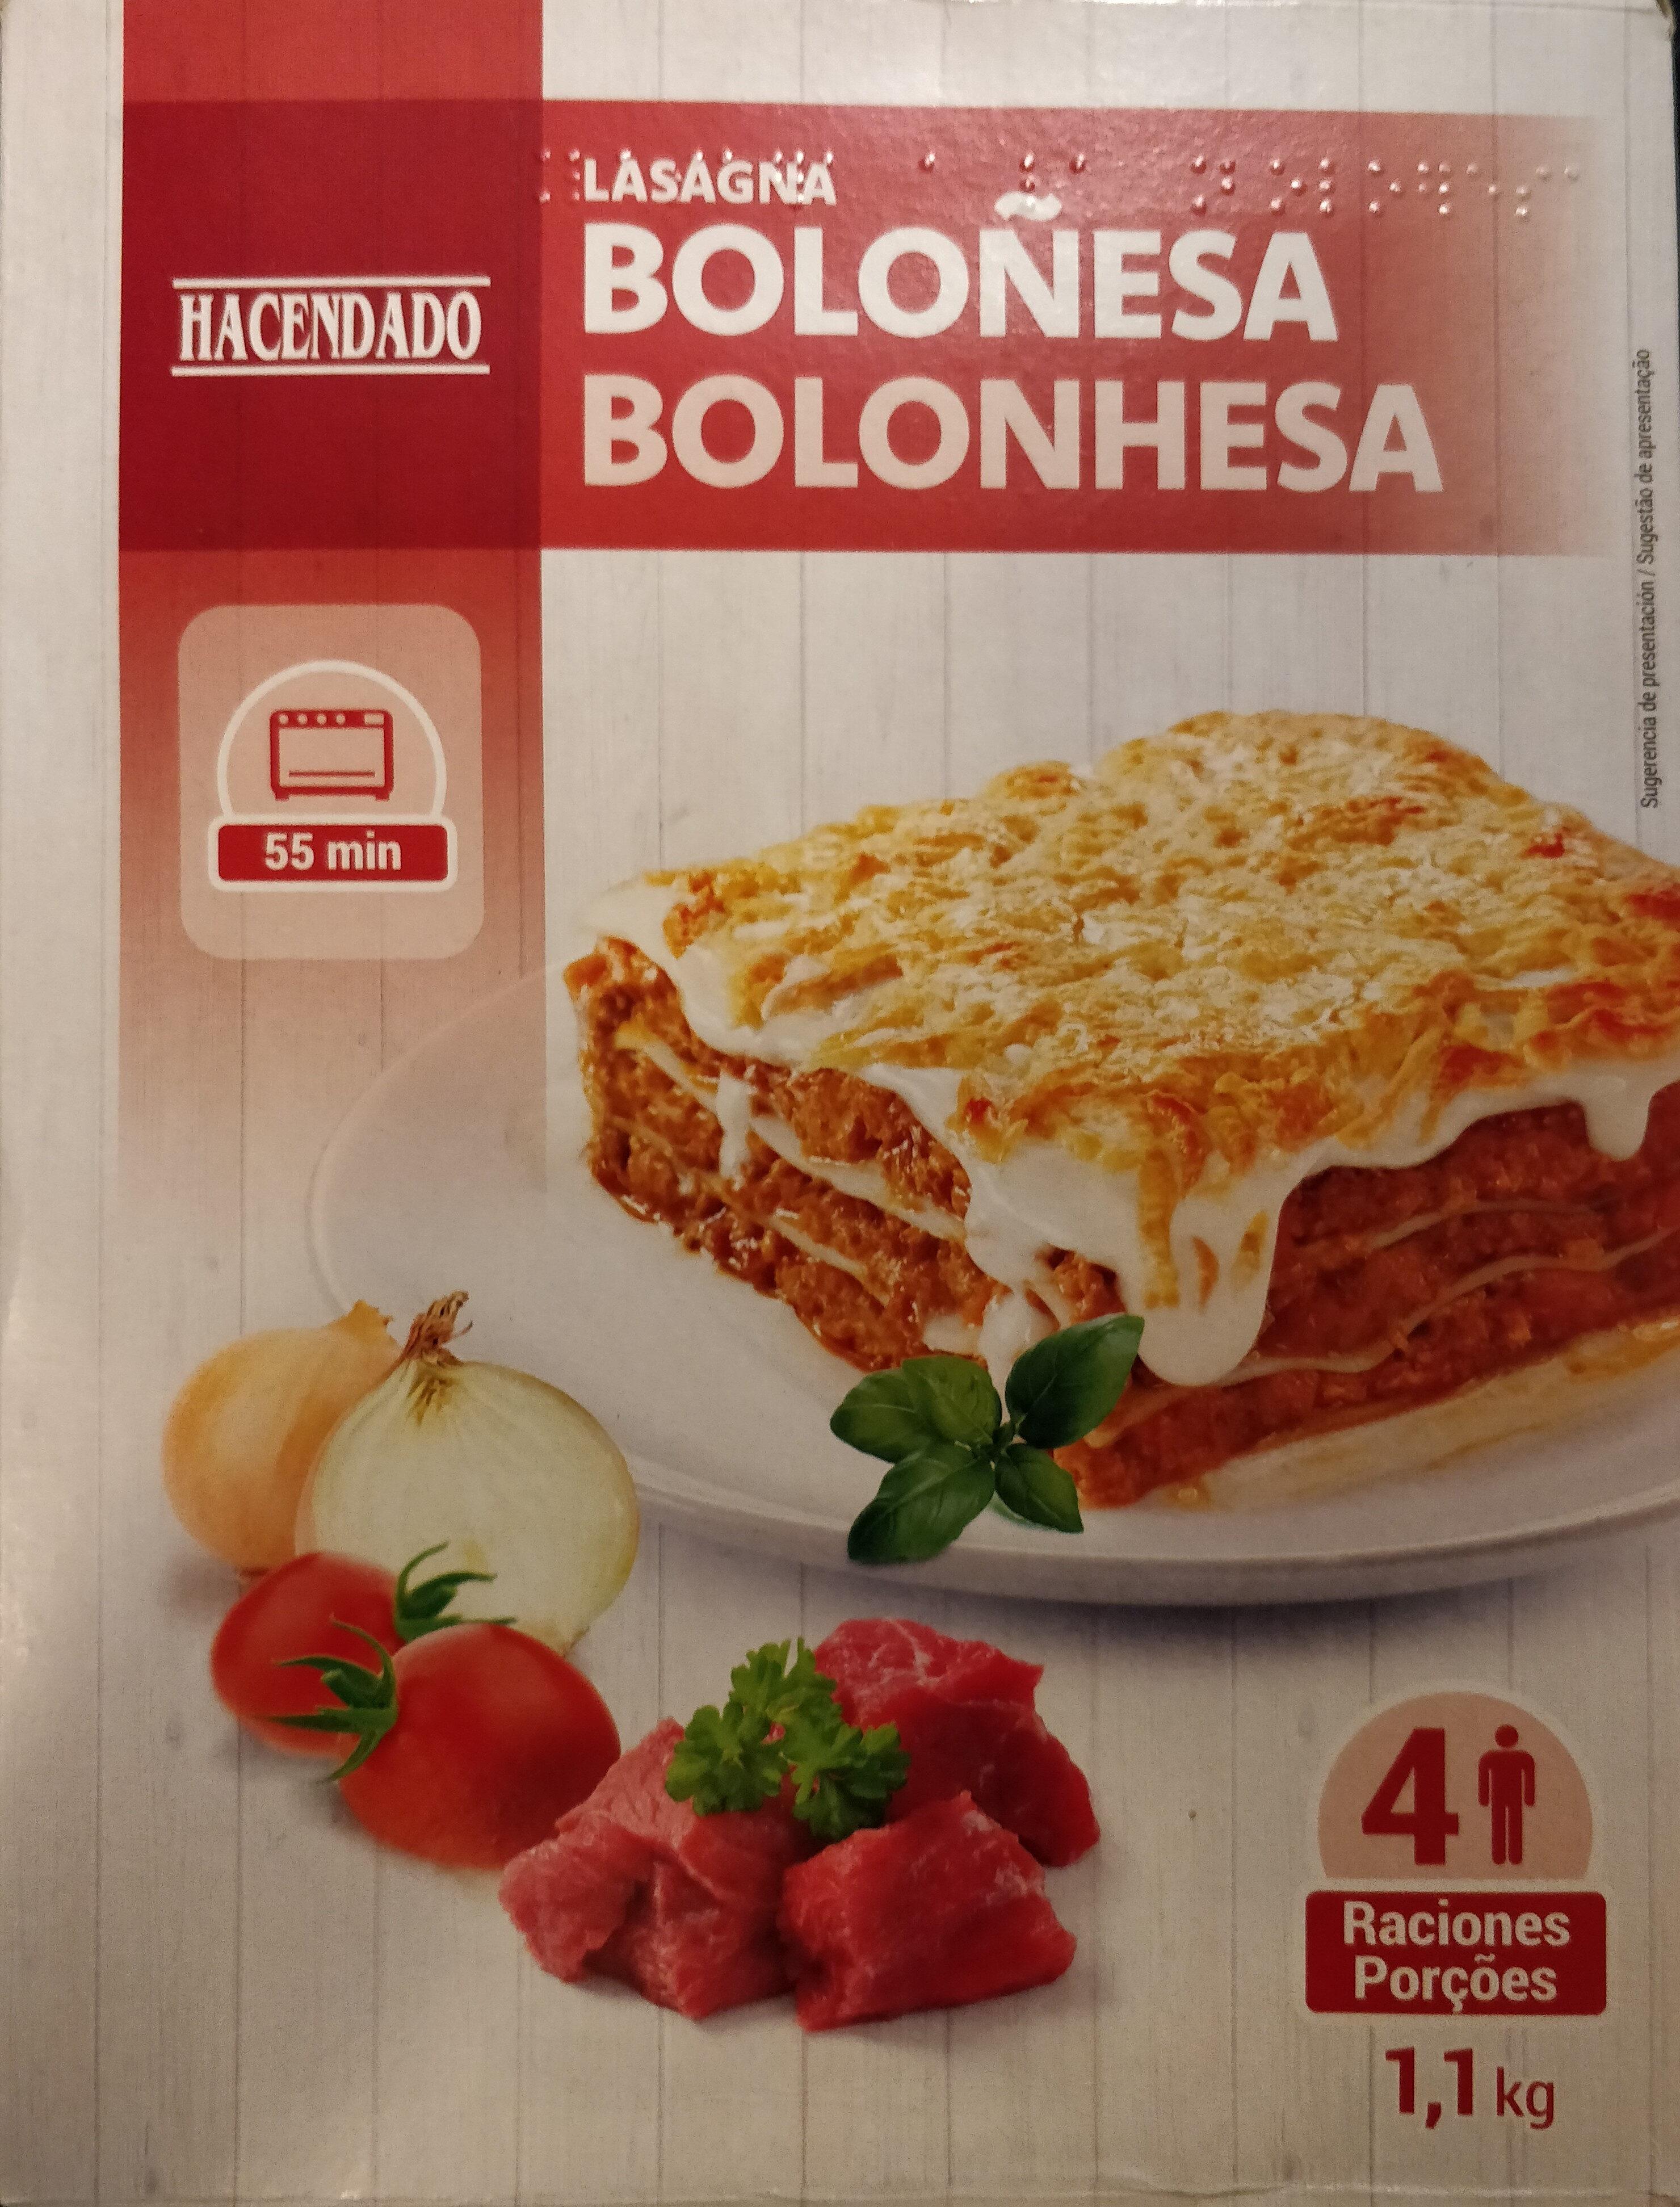 Lasaña Boloñesa - Product